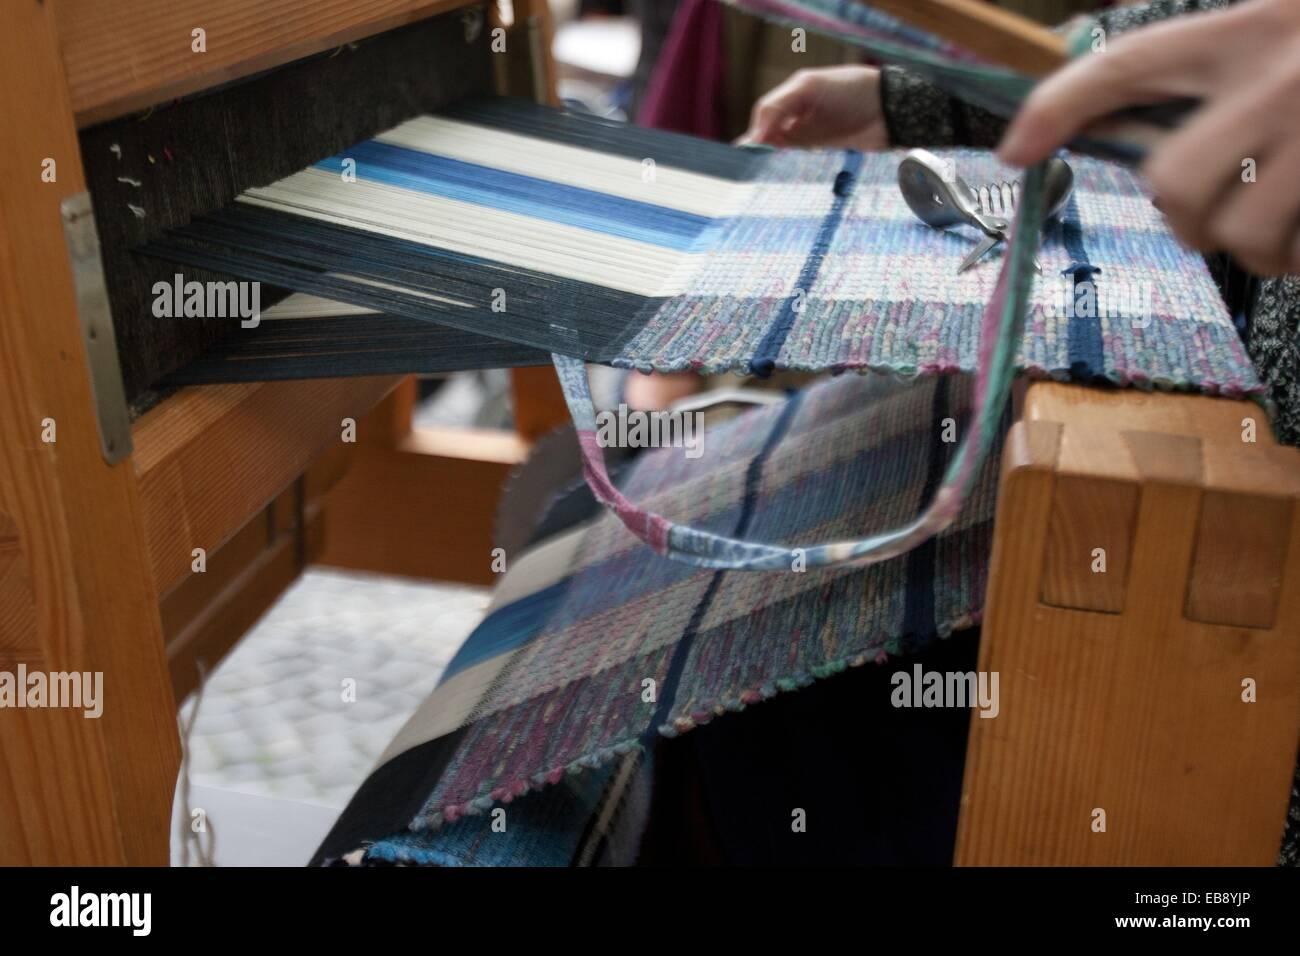 Woman weaving, Loom, Bratislava, Slovakia - Stock Image